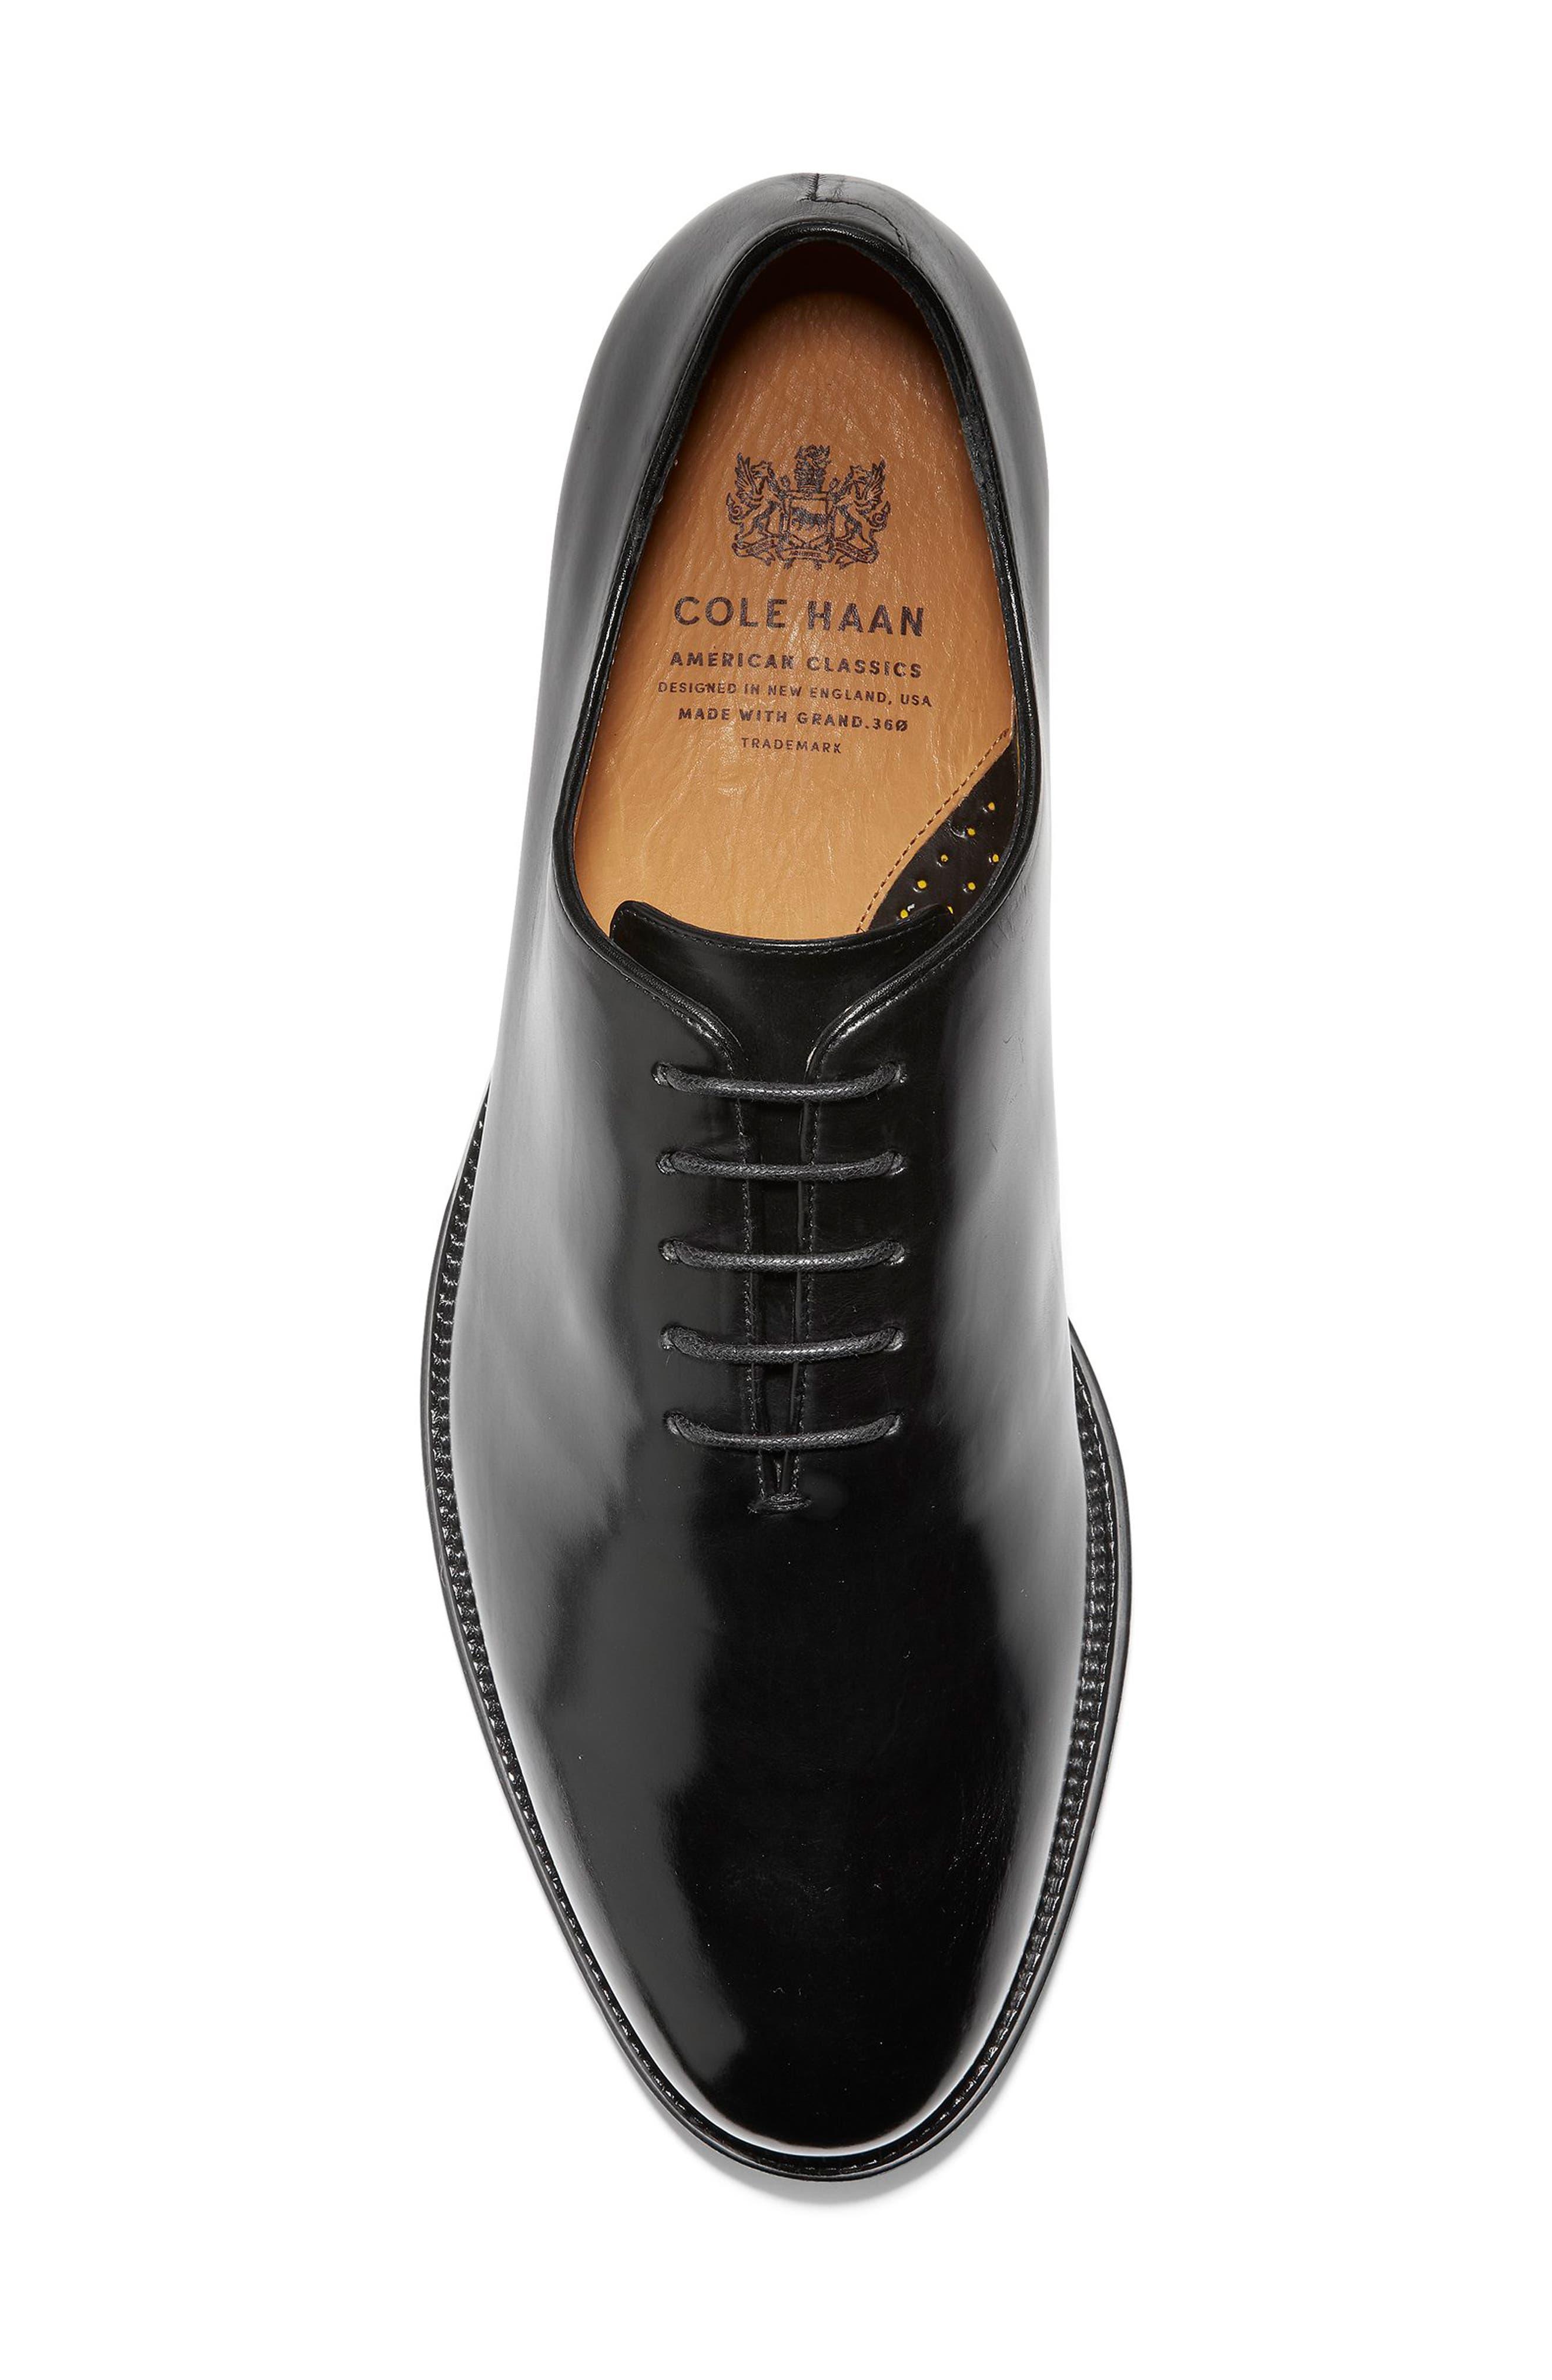 COLE HAAN, American Classics Gramercy Whole Cut Shoe, Alternate thumbnail 5, color, BLACK LEATHER